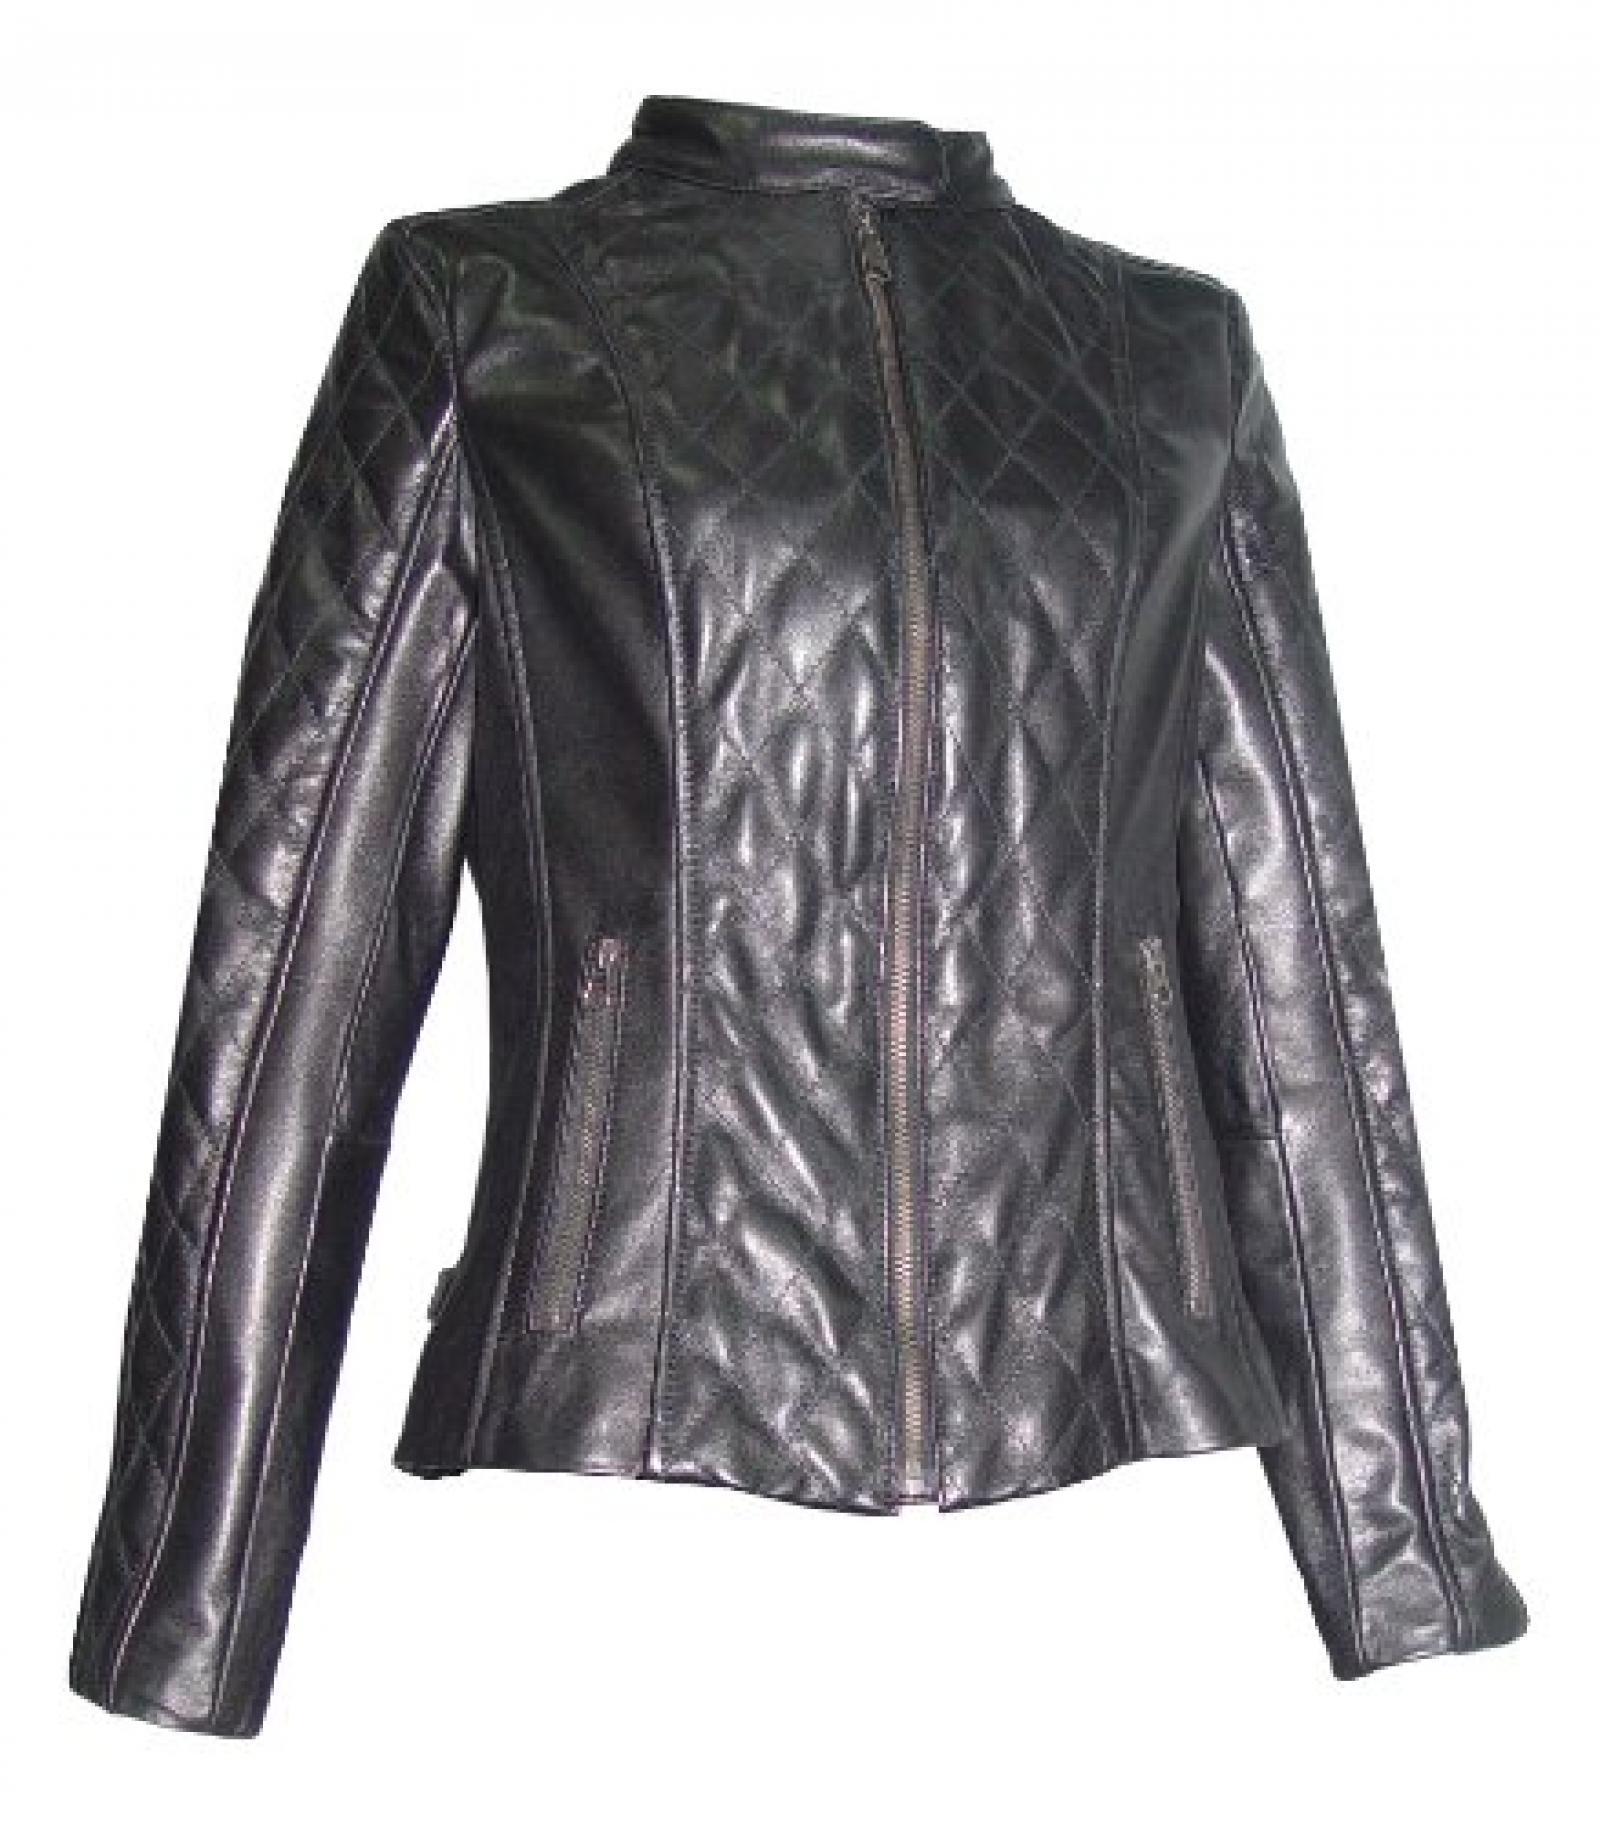 Nettailor Women PETITE SZ 4060 Lamb Leather Quilted Moto Jacket